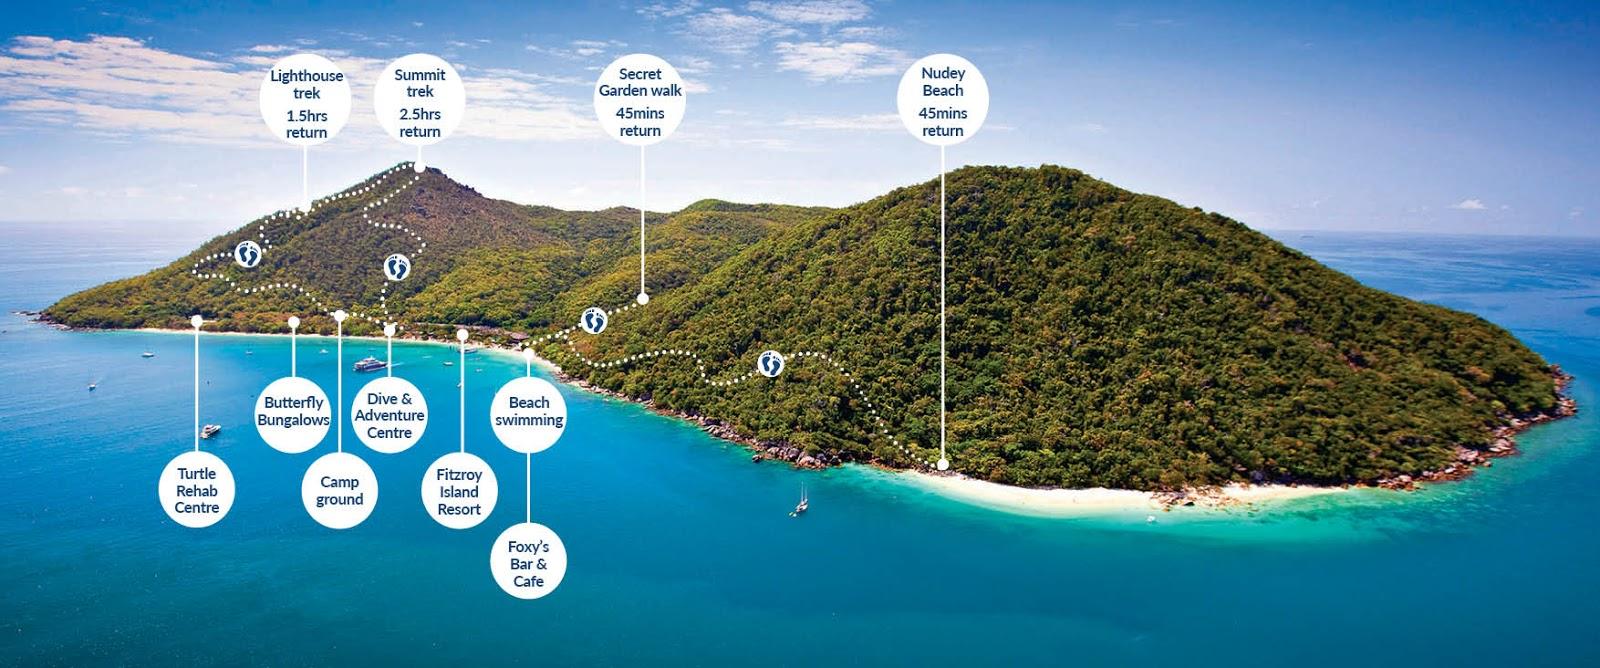 凱恩斯-大堡礁-翡翠島-地圖-Map-內堡礁-推薦-旅遊-自由行-澳洲-Carins-Great-Barrier-Reef-Fitzroy-Island-Travel-Australia